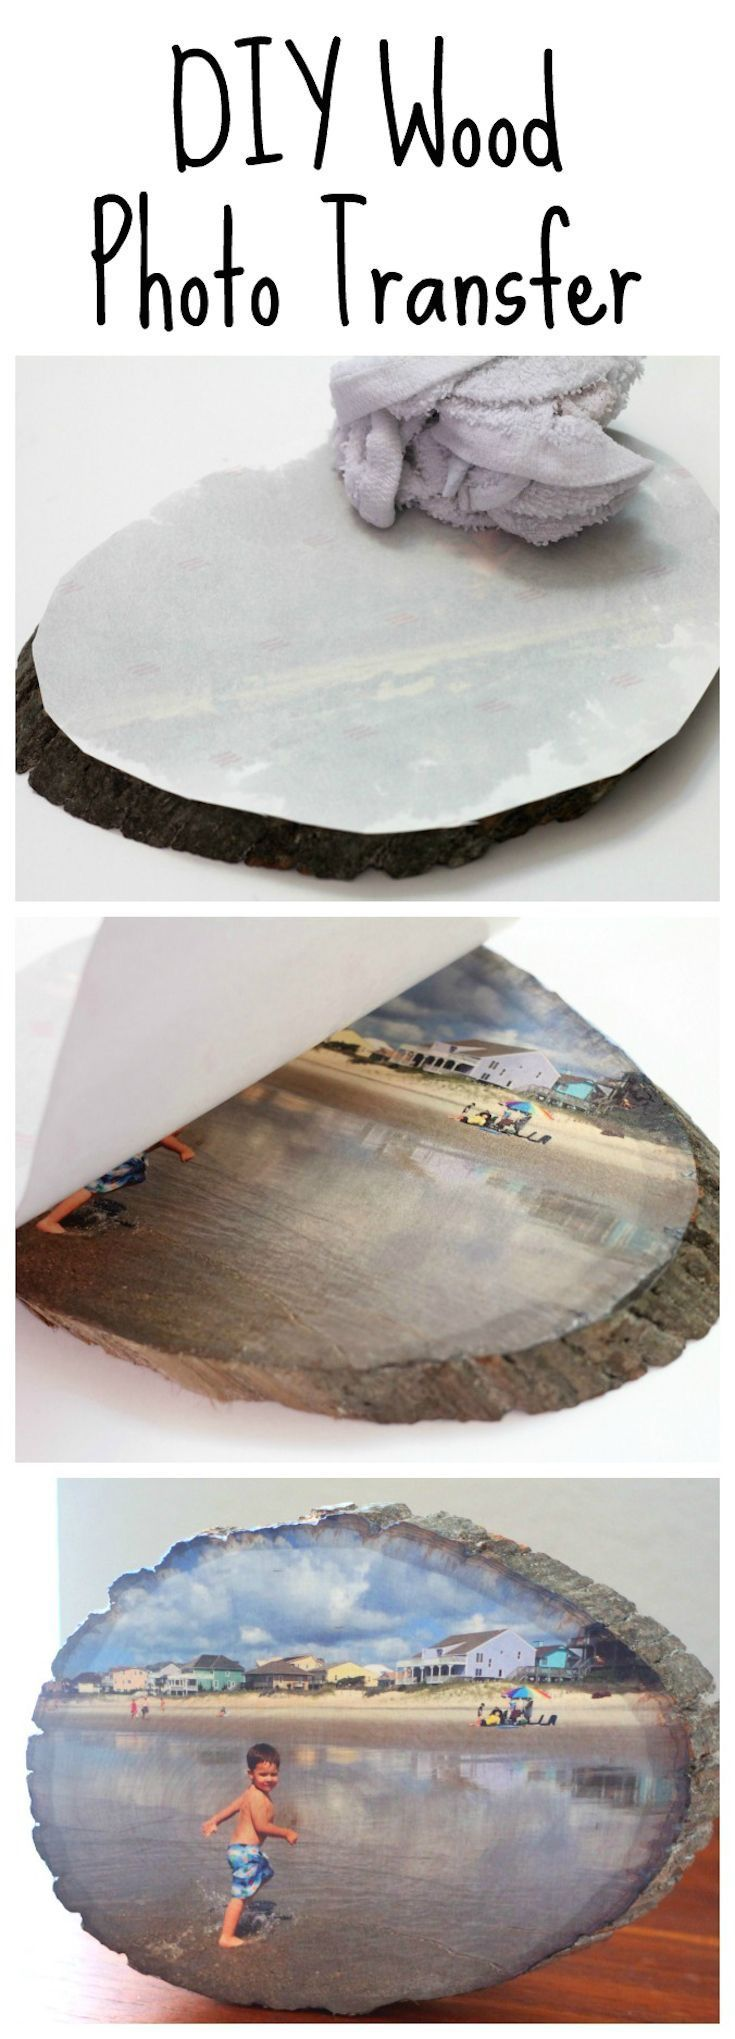 Photo transfer wood #decopodge Photo transfer wood #decopodge